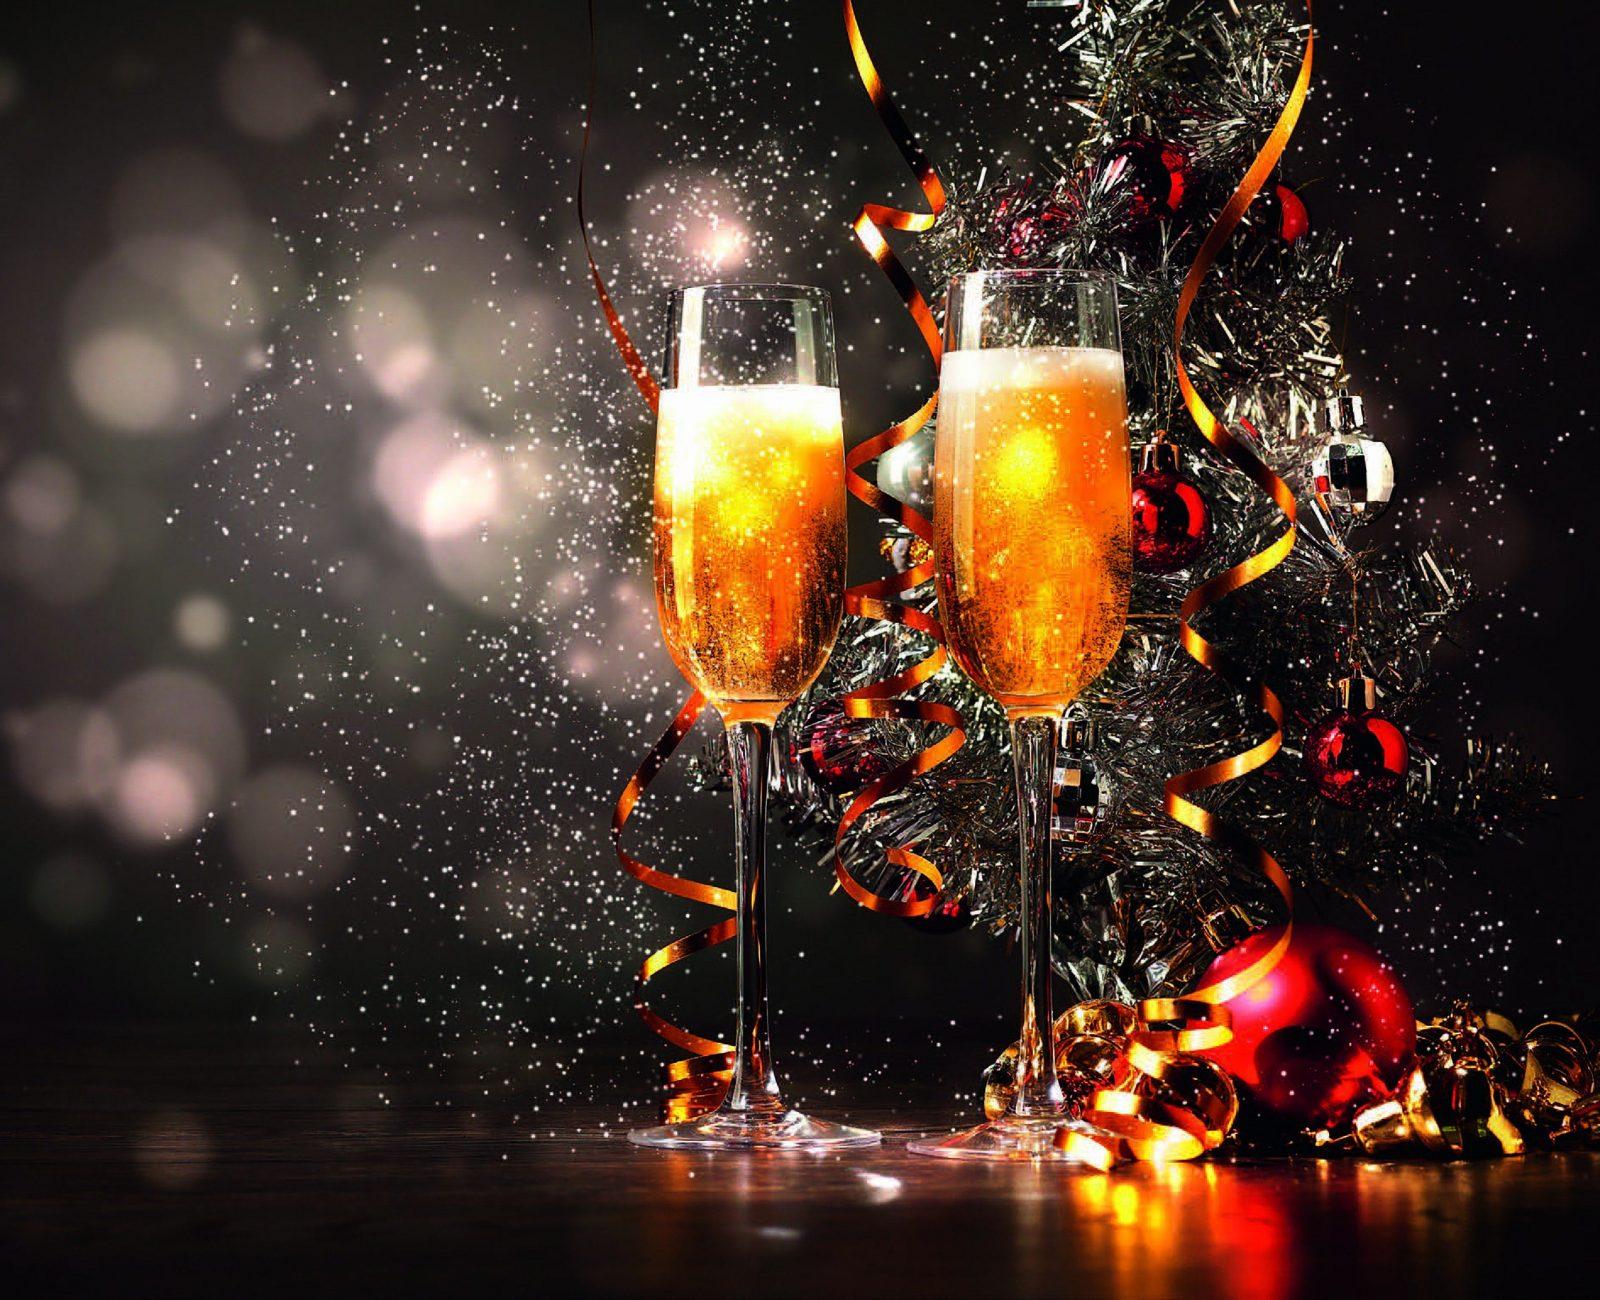 Champagne and streamers. Hilton Adelaide Festive Season 2018.